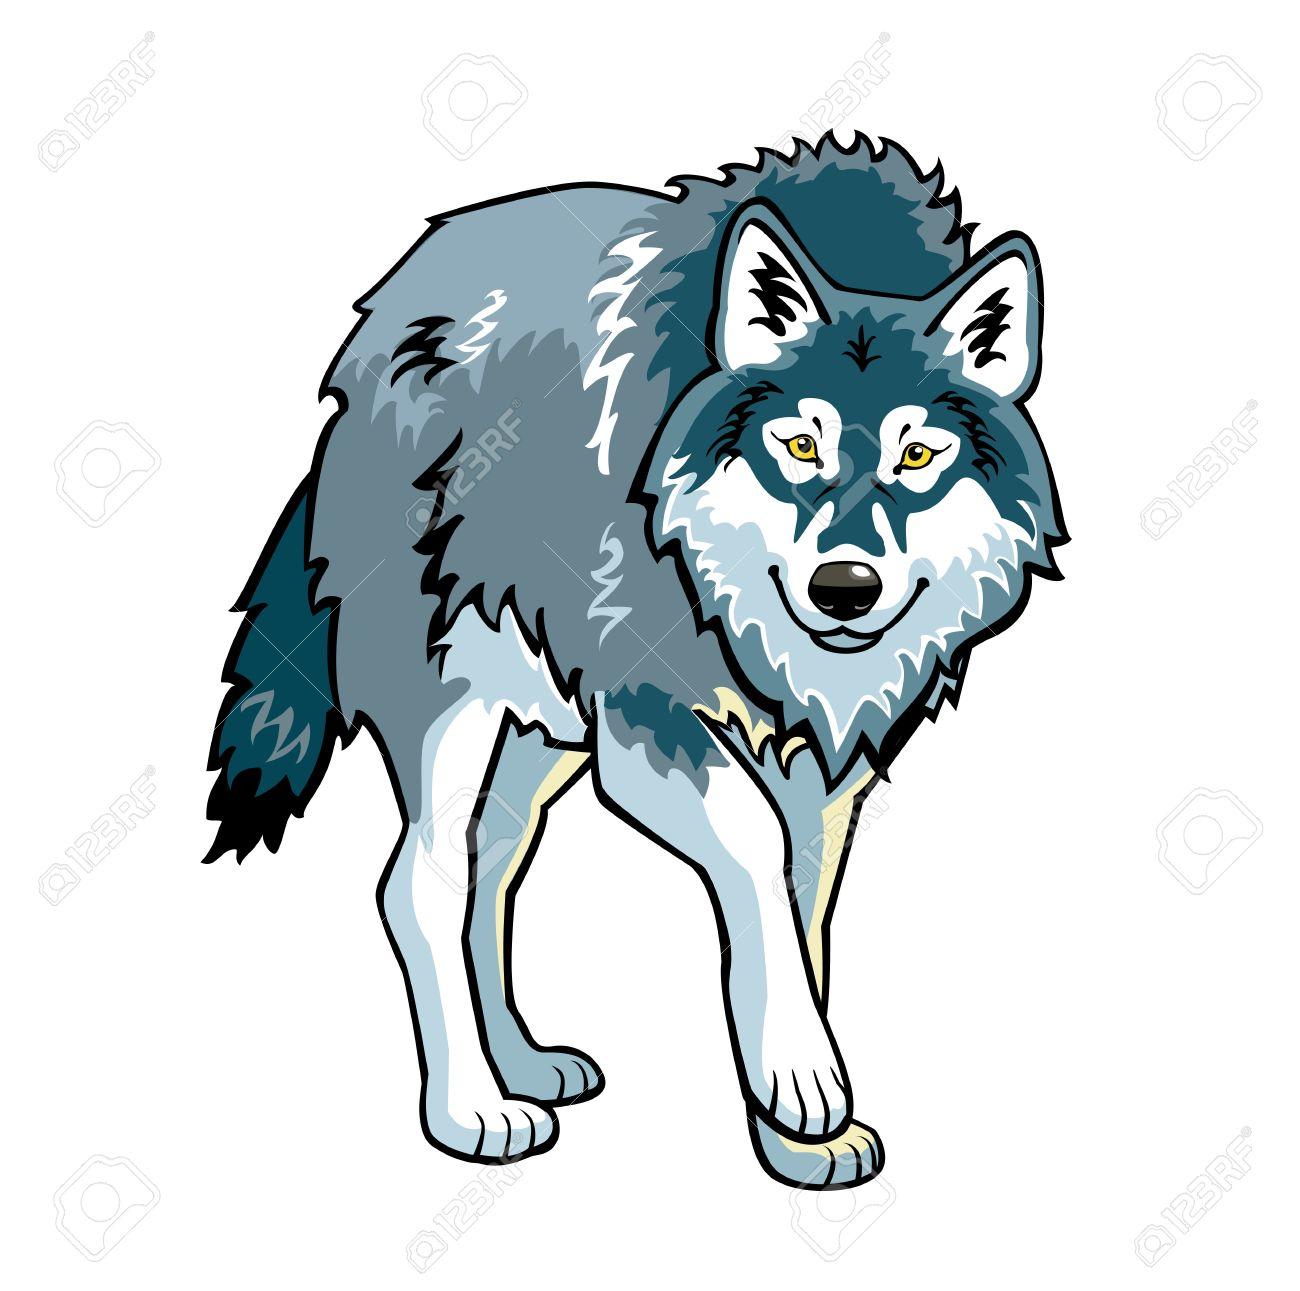 Wolf clipart Clipart wolf%20clipart%20 Clipart Panda Free